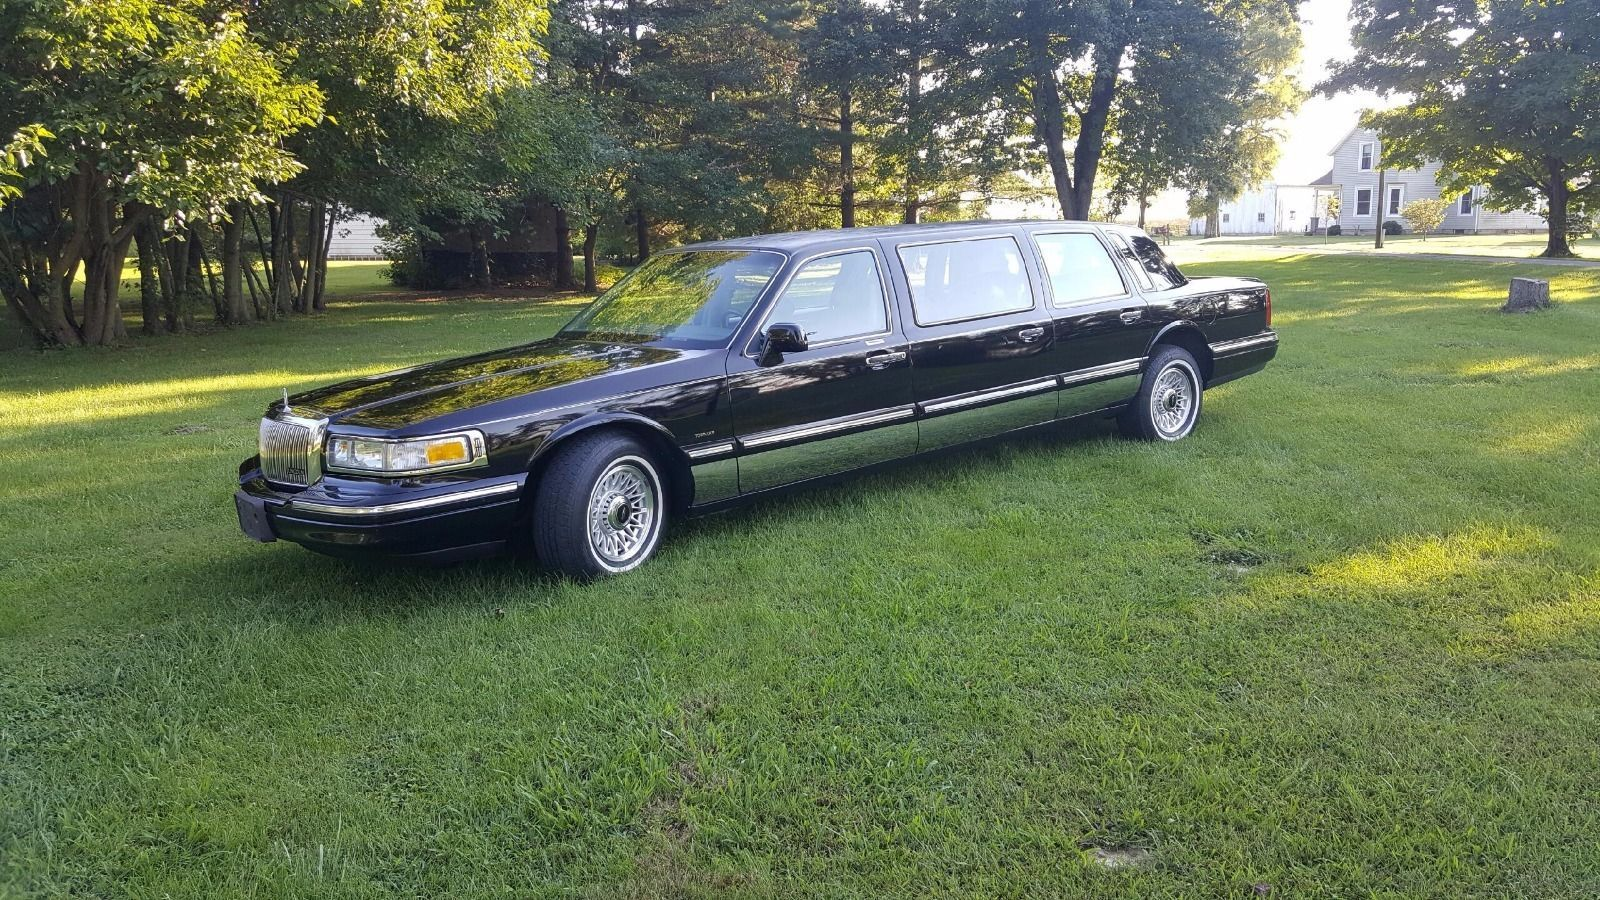 1997 lincoln town car 6 door limousine funeral coach